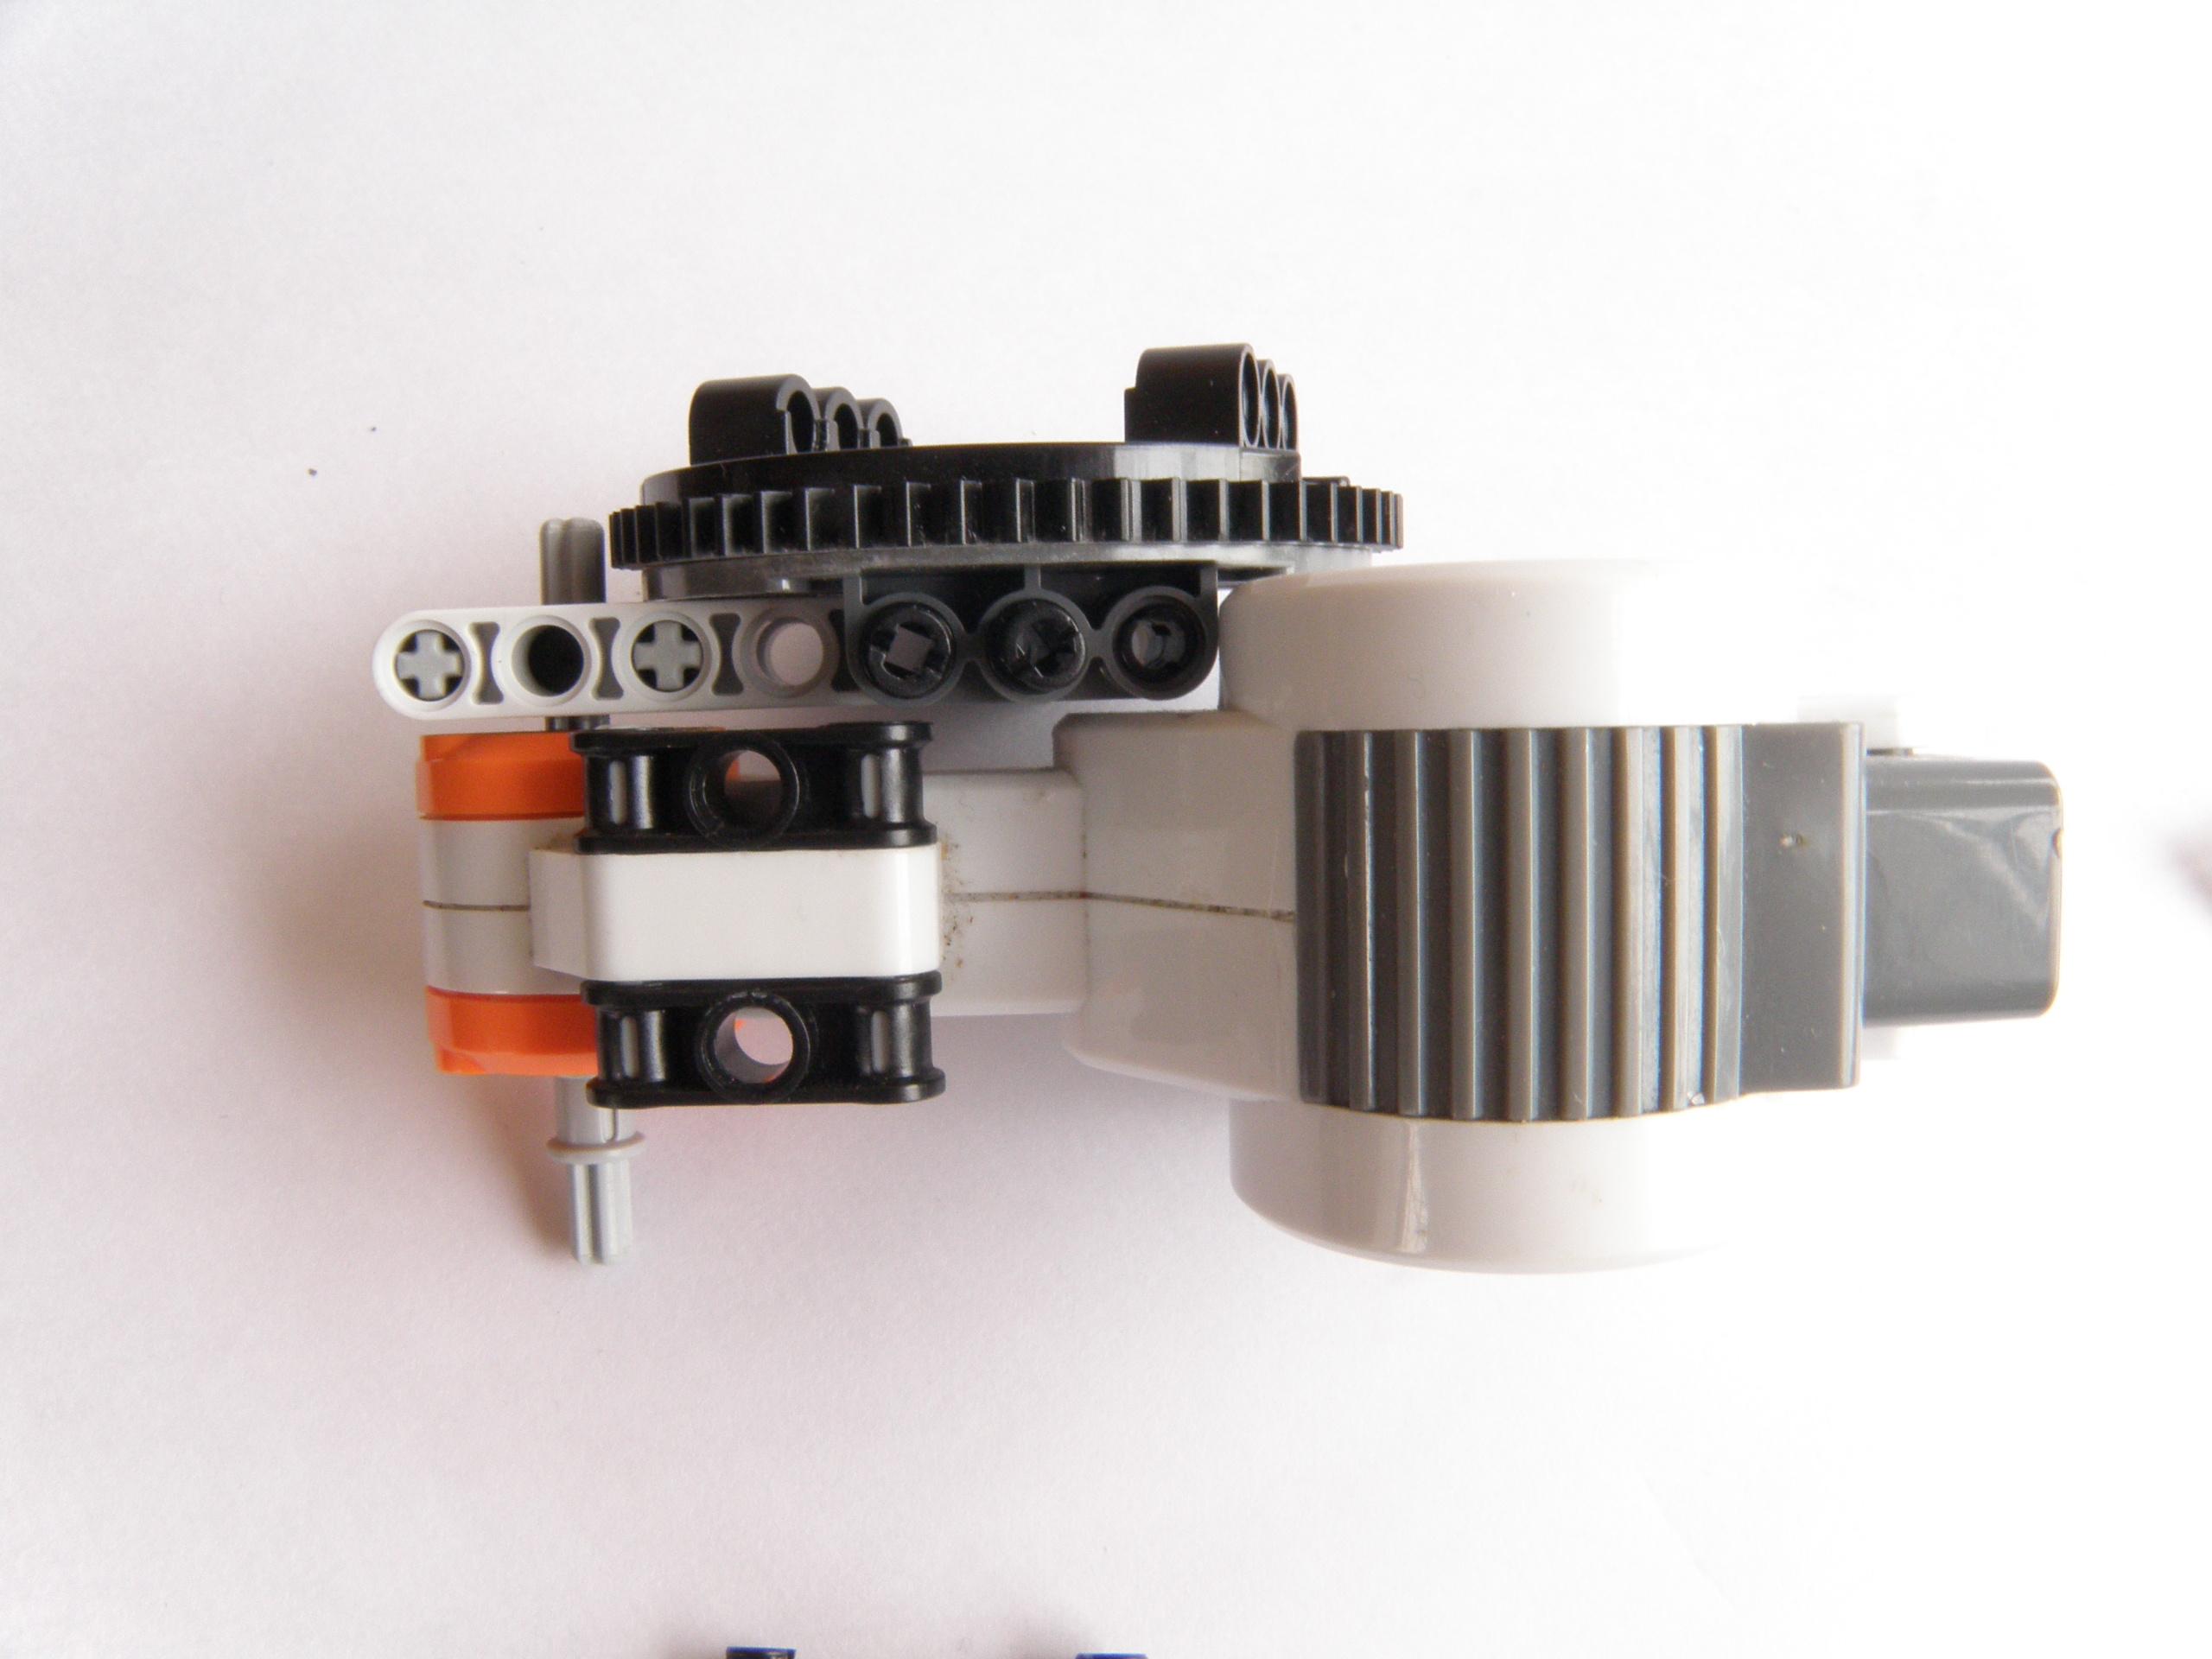 lego mindstorms robotic arm building instructions